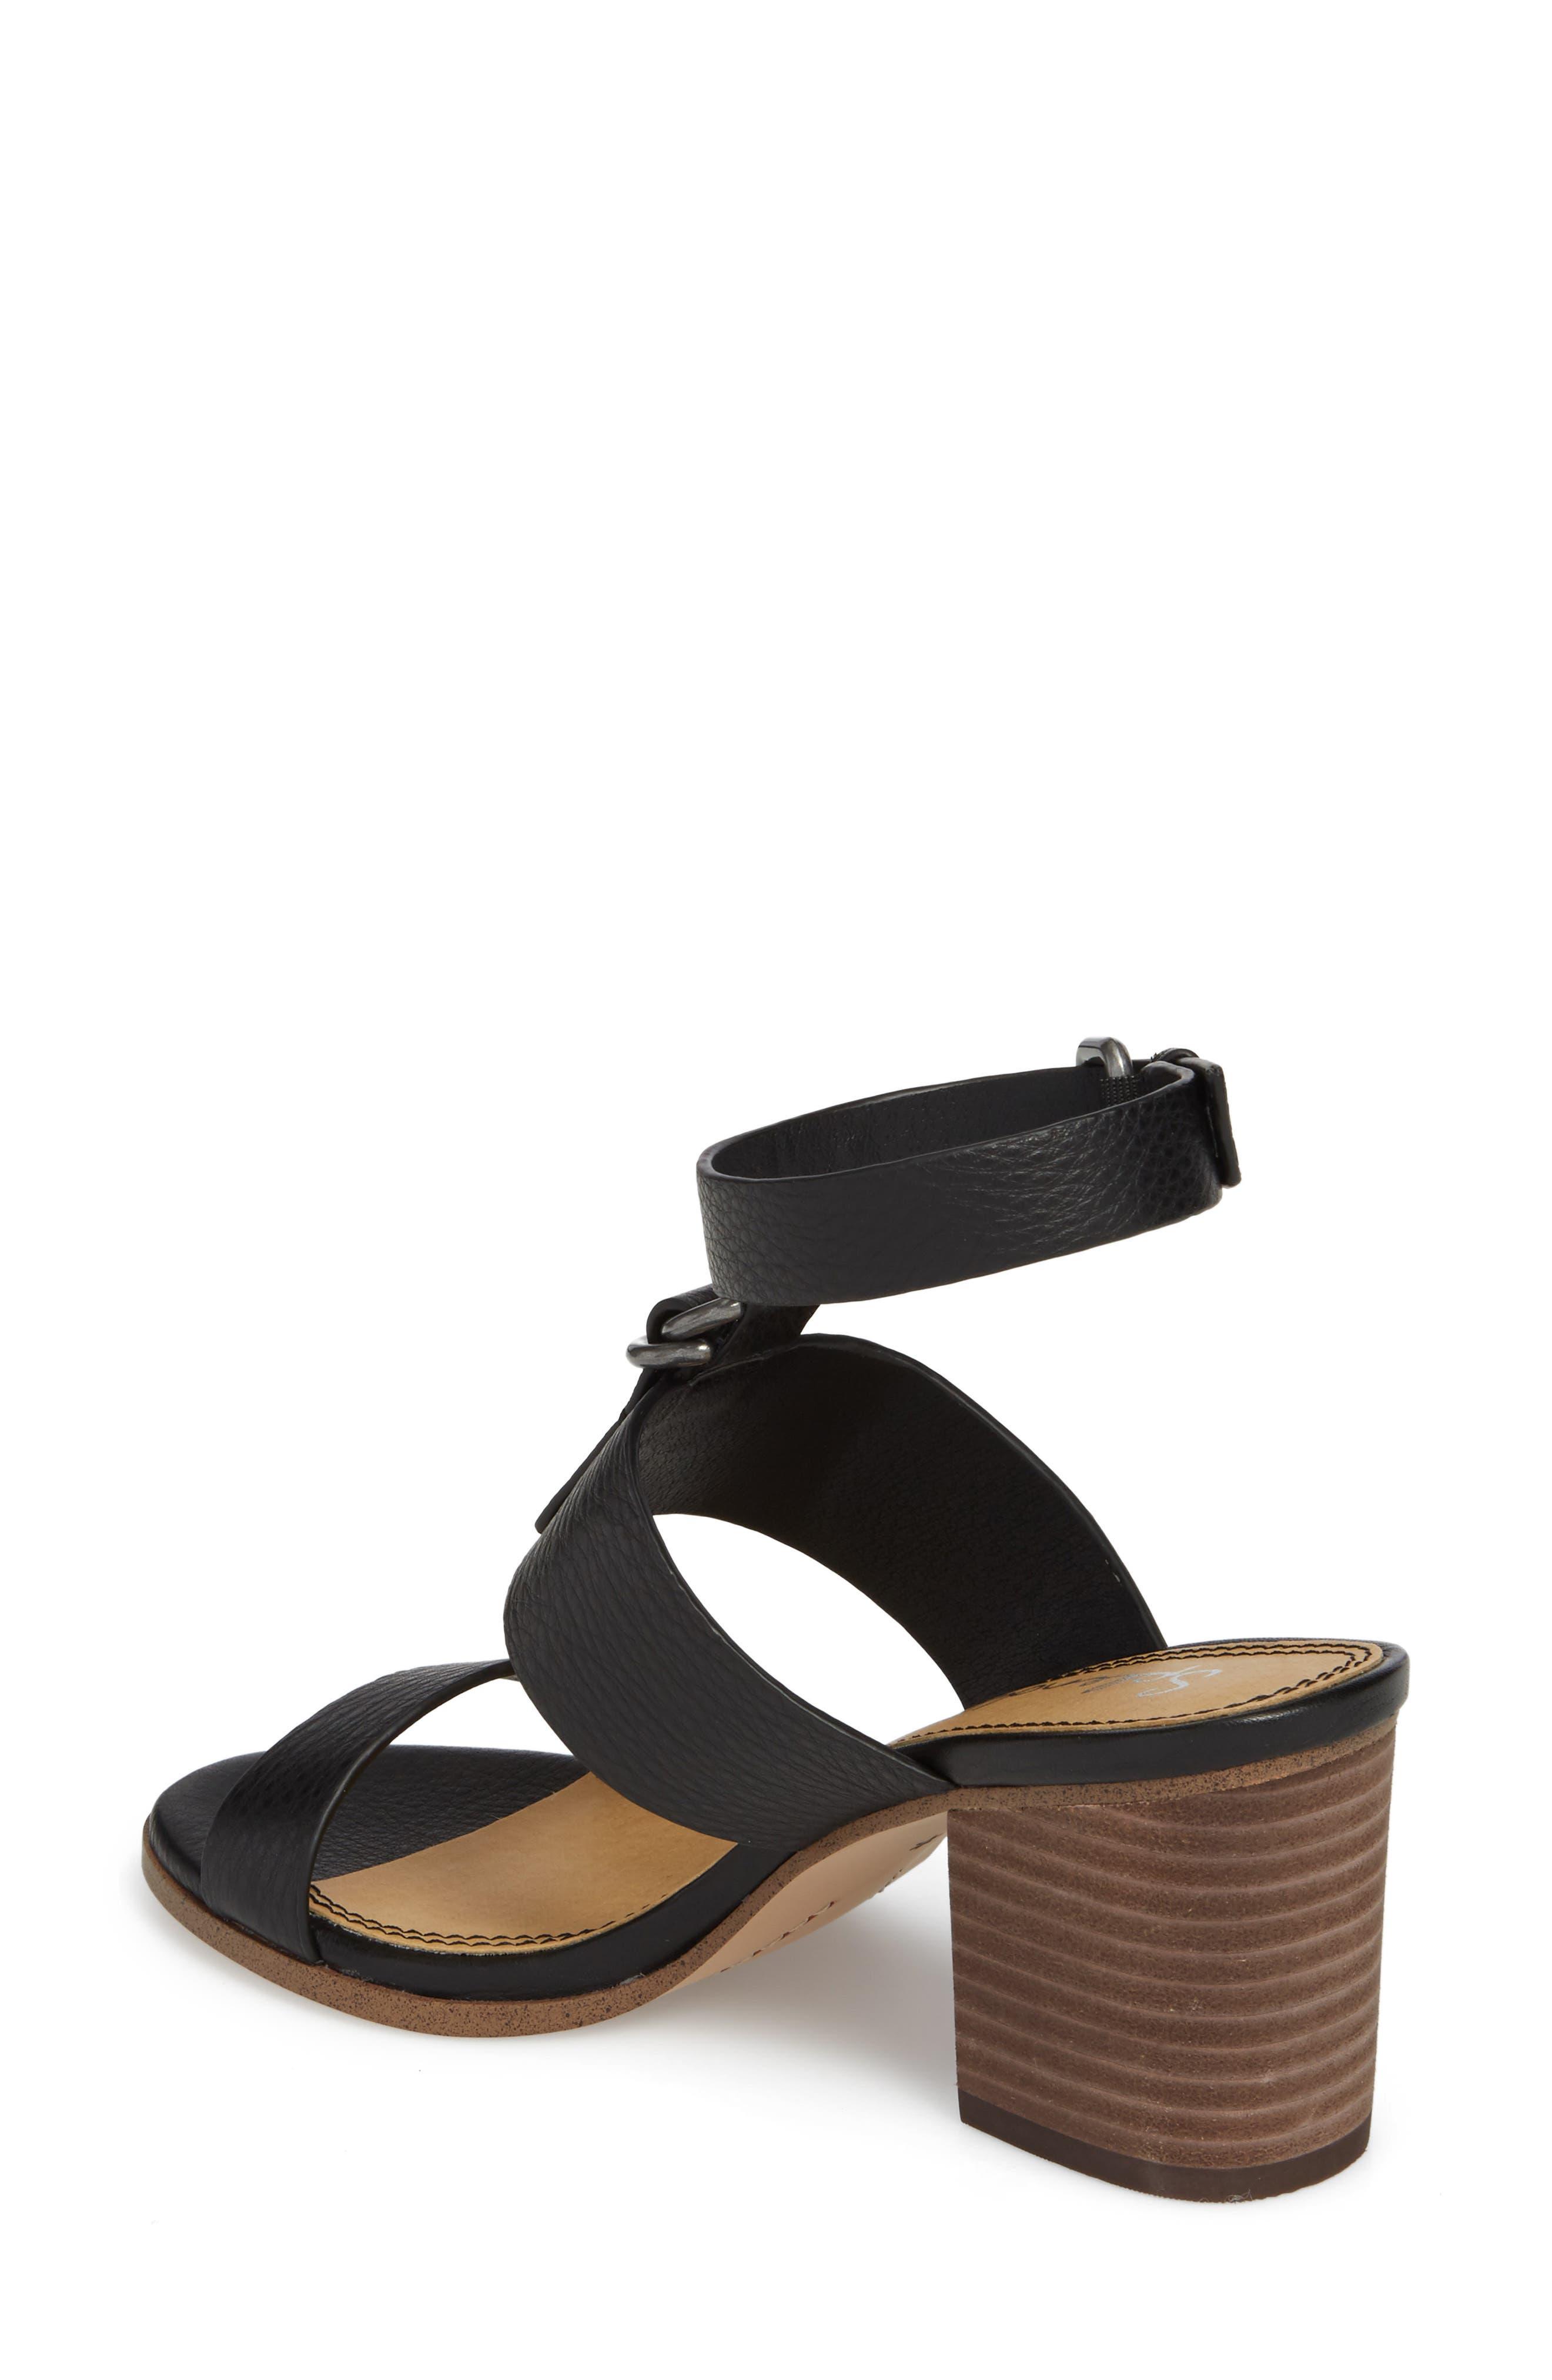 Faron Block Heel Sandal,                             Alternate thumbnail 4, color,